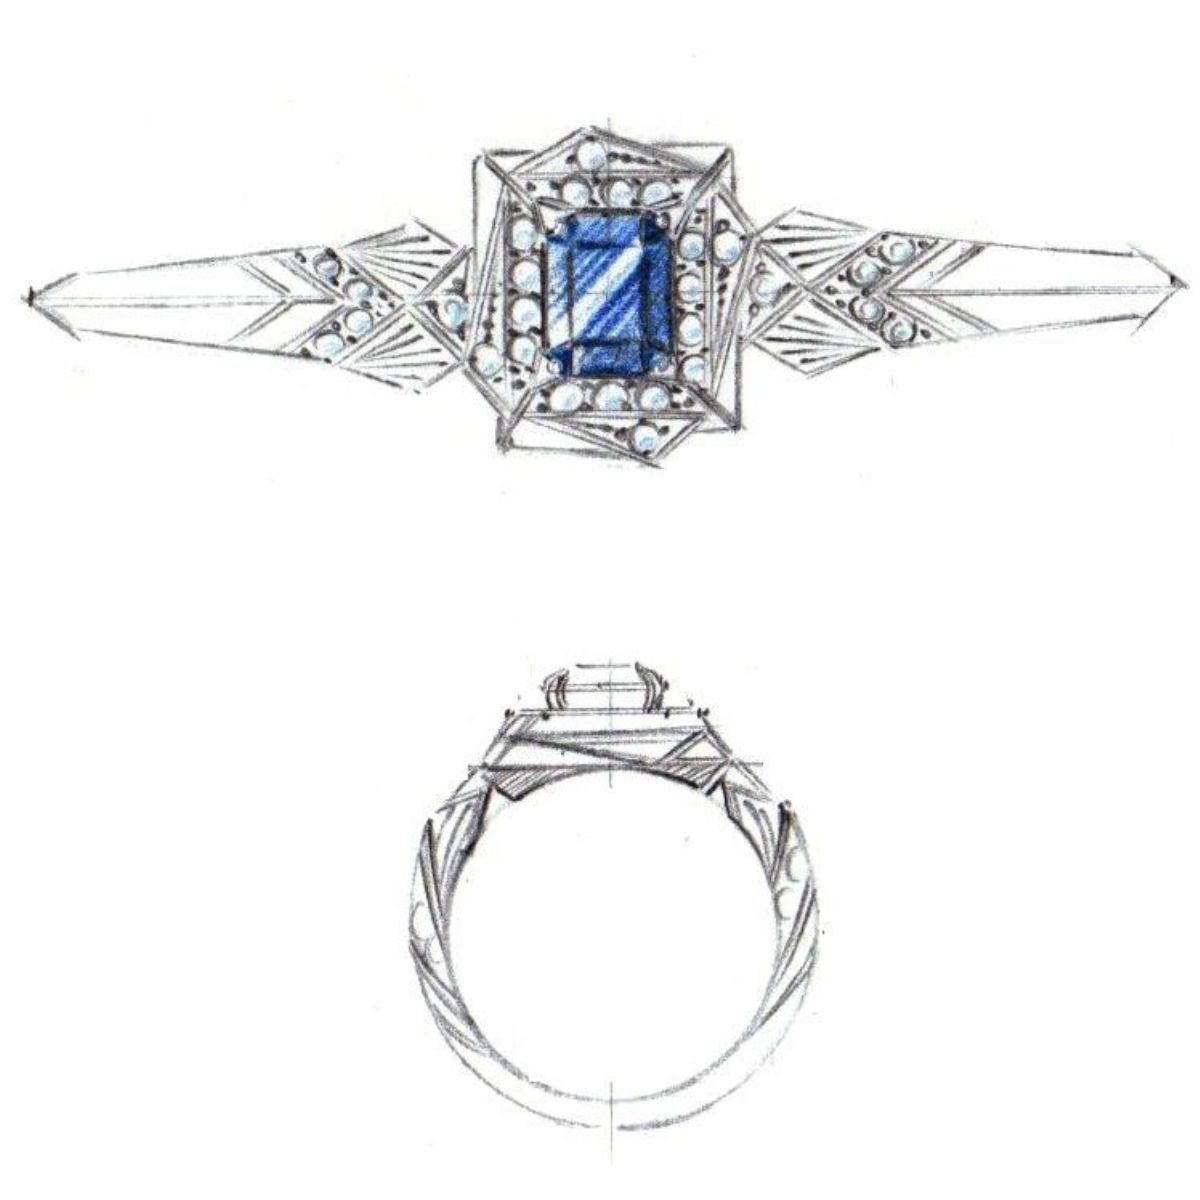 modern art deco sketch - vintage engagement rings